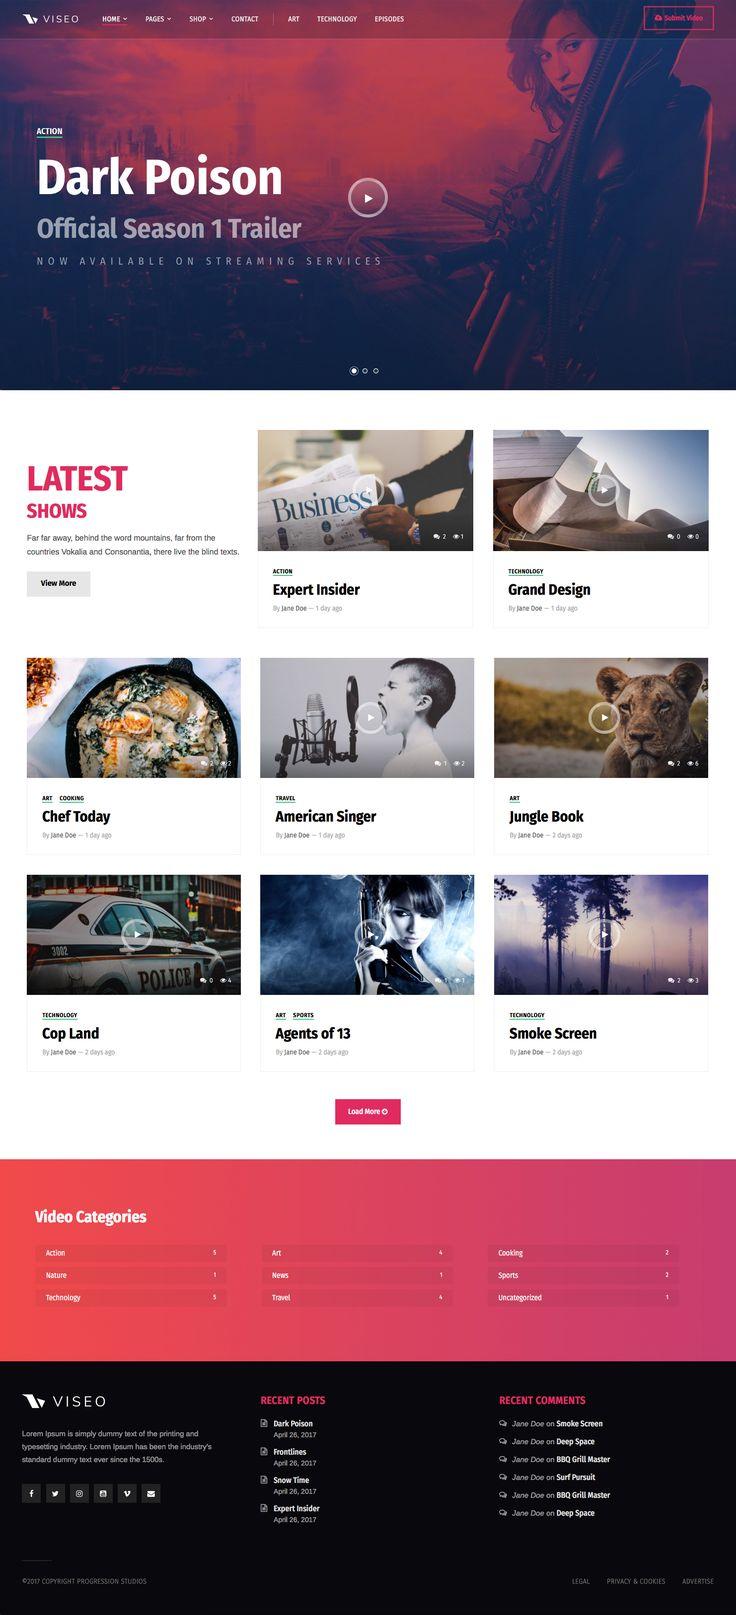 Ad: Viseo - News, Video, & Podcast Theme by ProgressionStudios | ThemeForest 59$